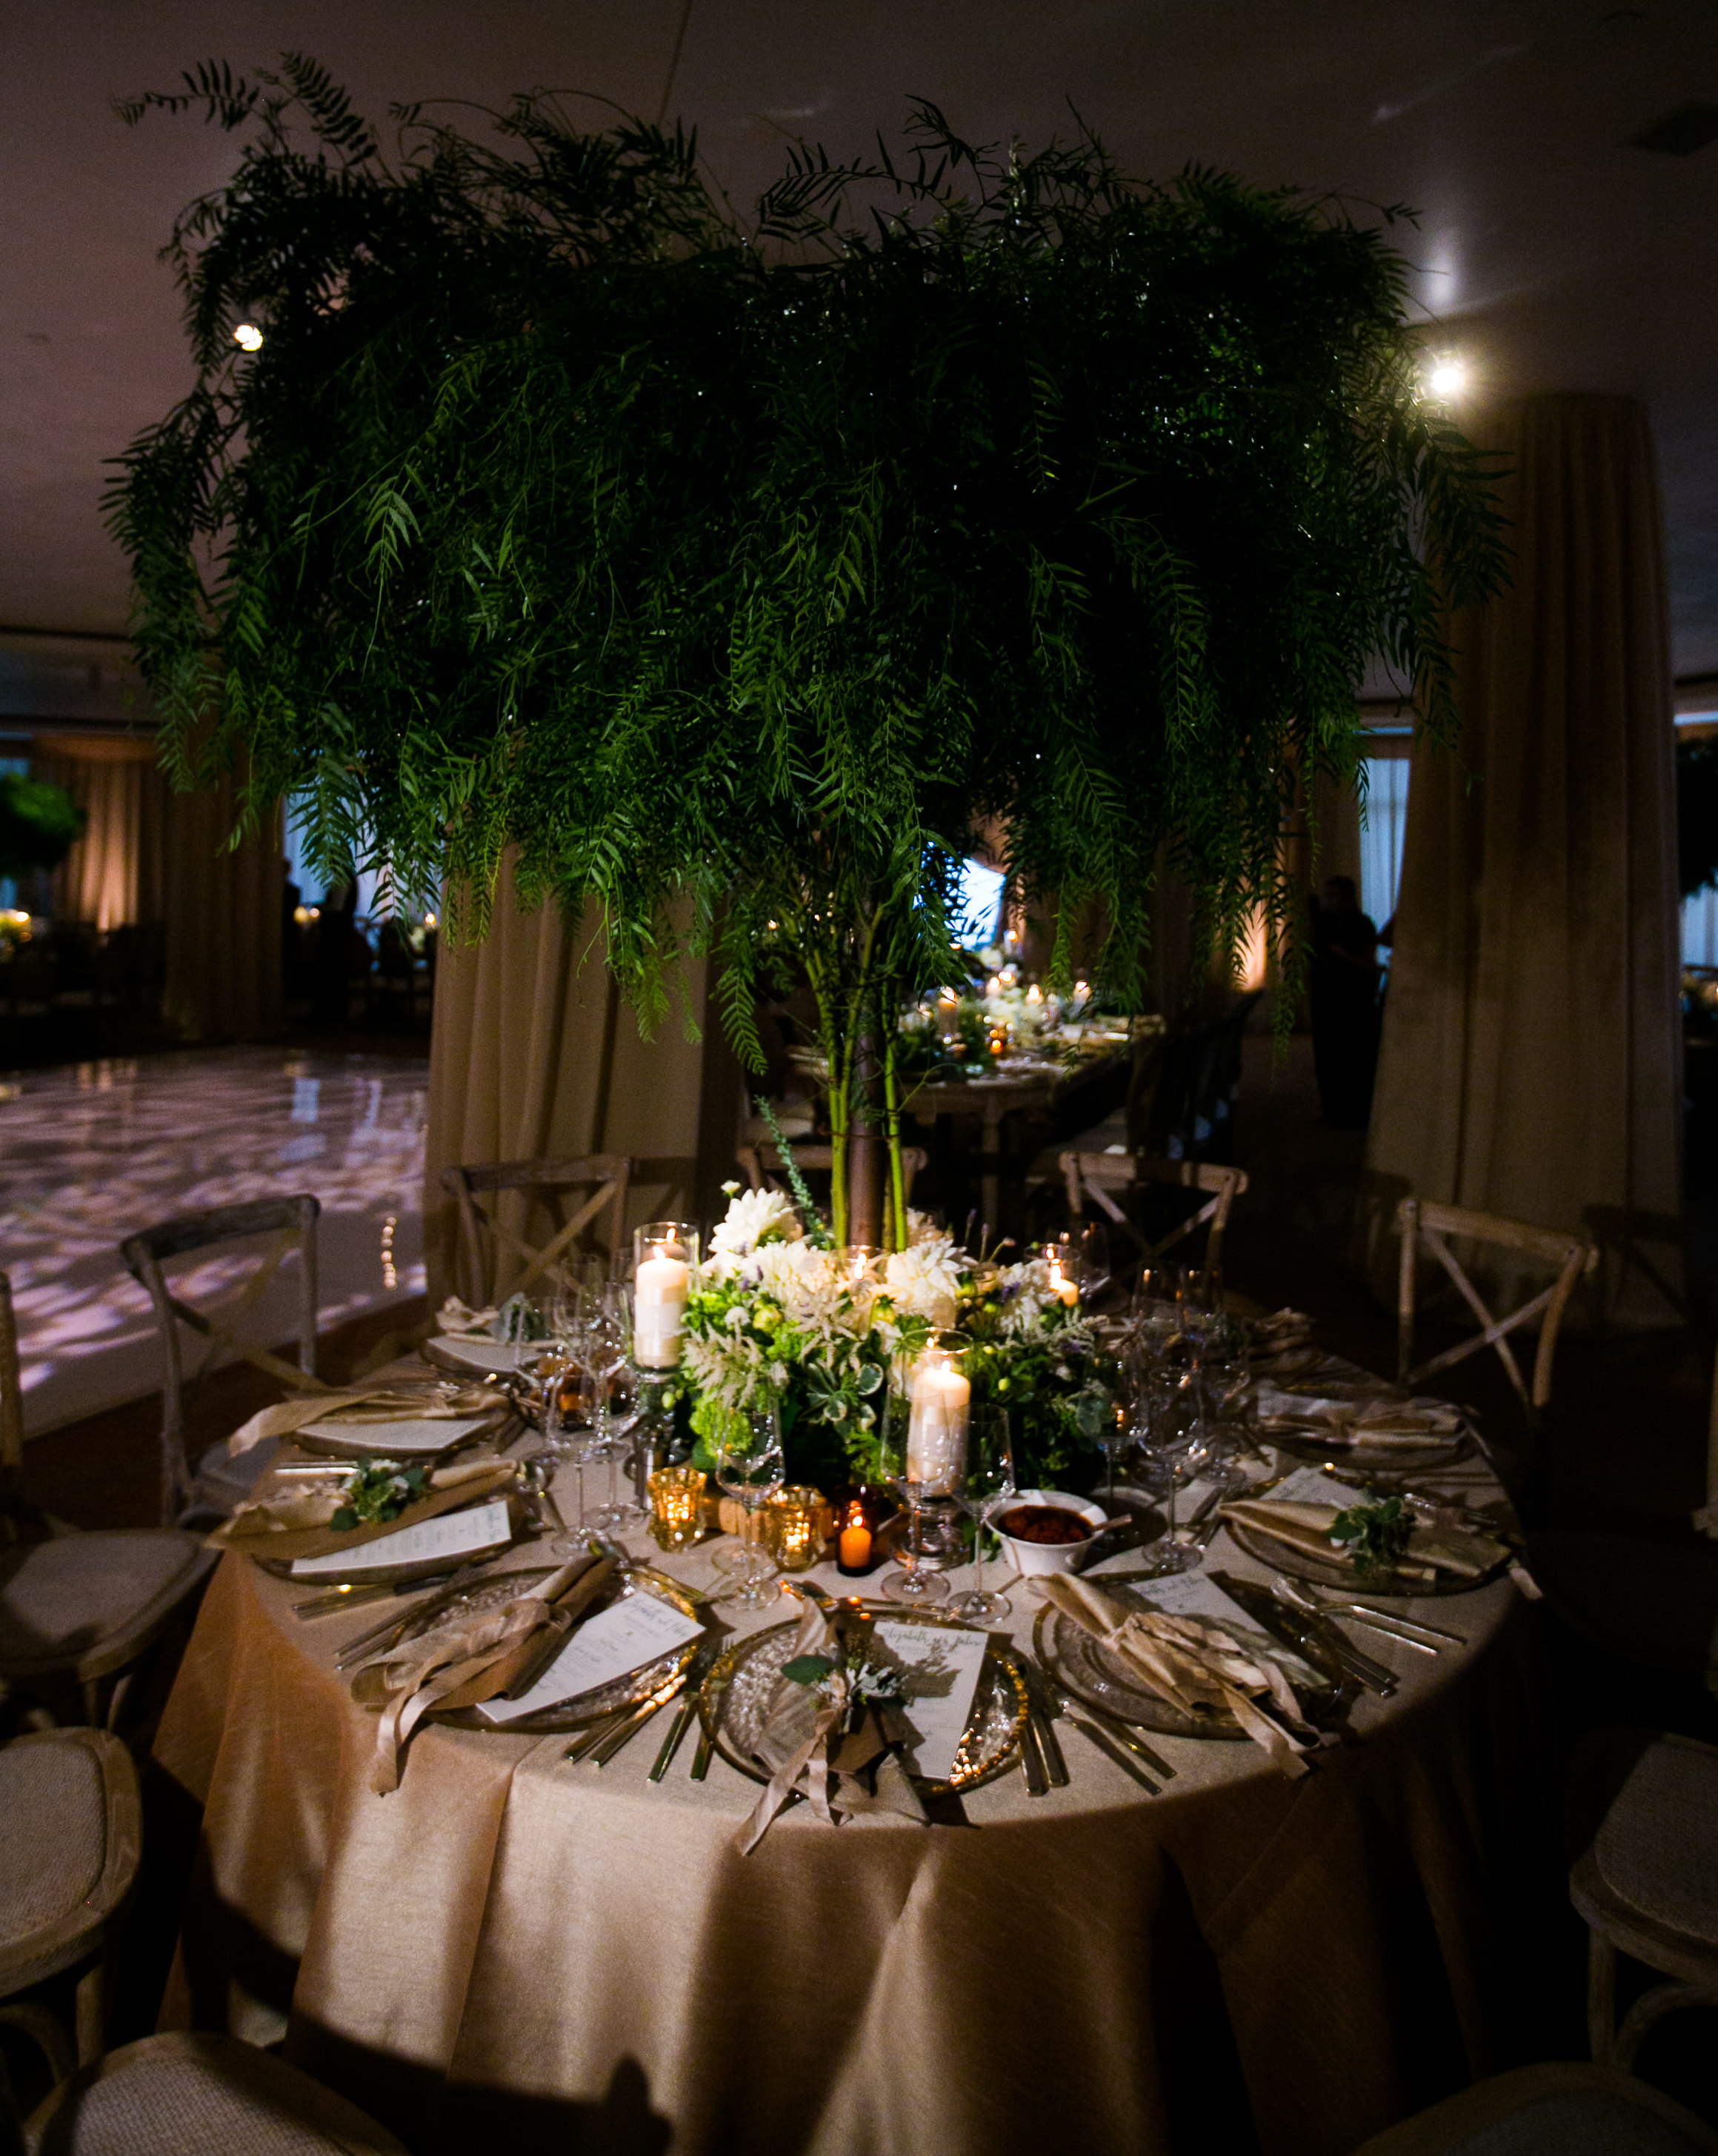 www.santabarbarawedding.com   Four Seasons Santa Barbara   Levine Fox Events   Callaway Gable Photo   Reception Tables